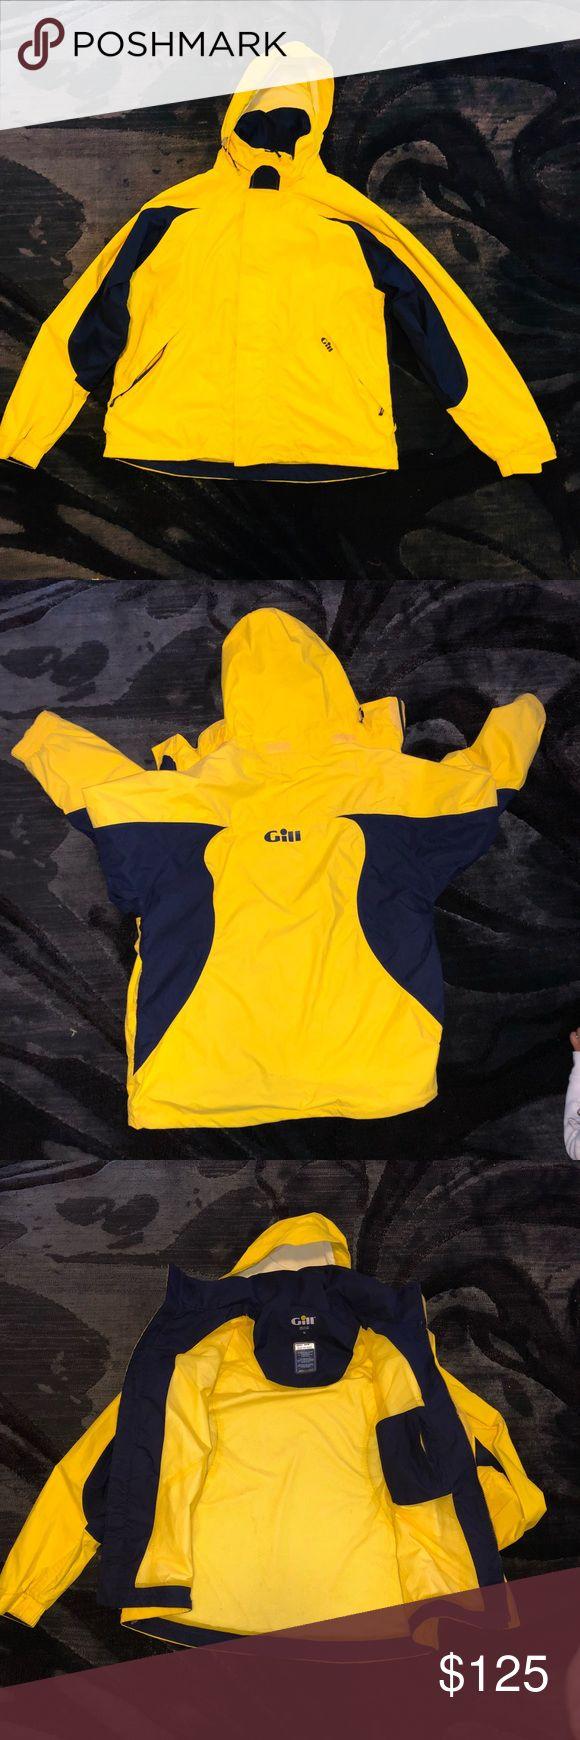 🌤GILL MENS COAST LITE JACKET🌧 Good condition  100% nylon Any question just ask GILL Jackets & Coats Raincoats